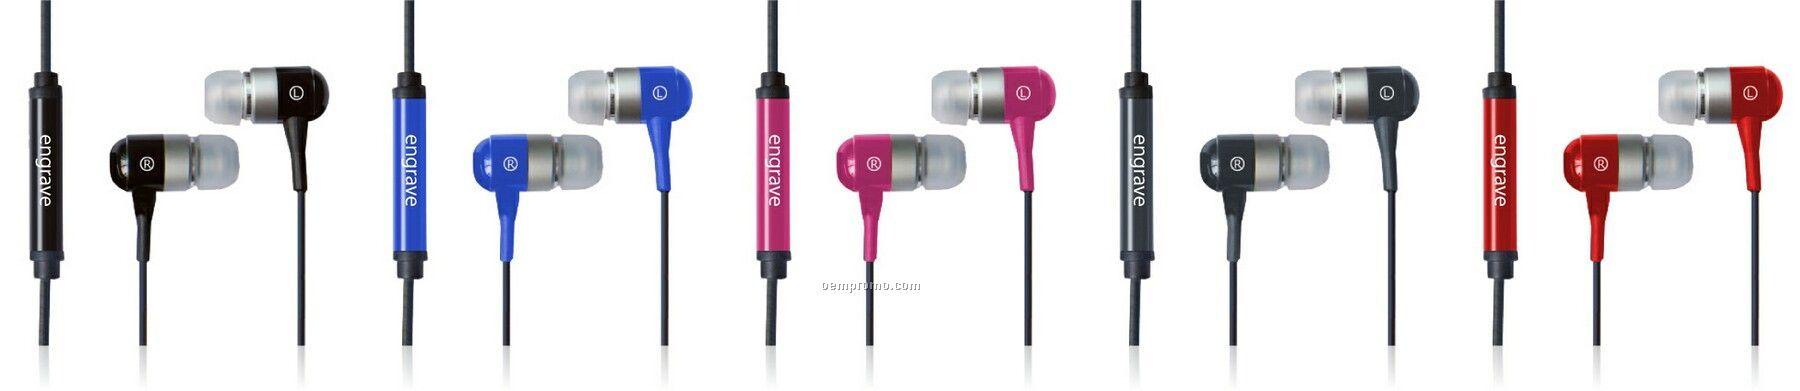 Metal Ear Buds (Model Ebm02)